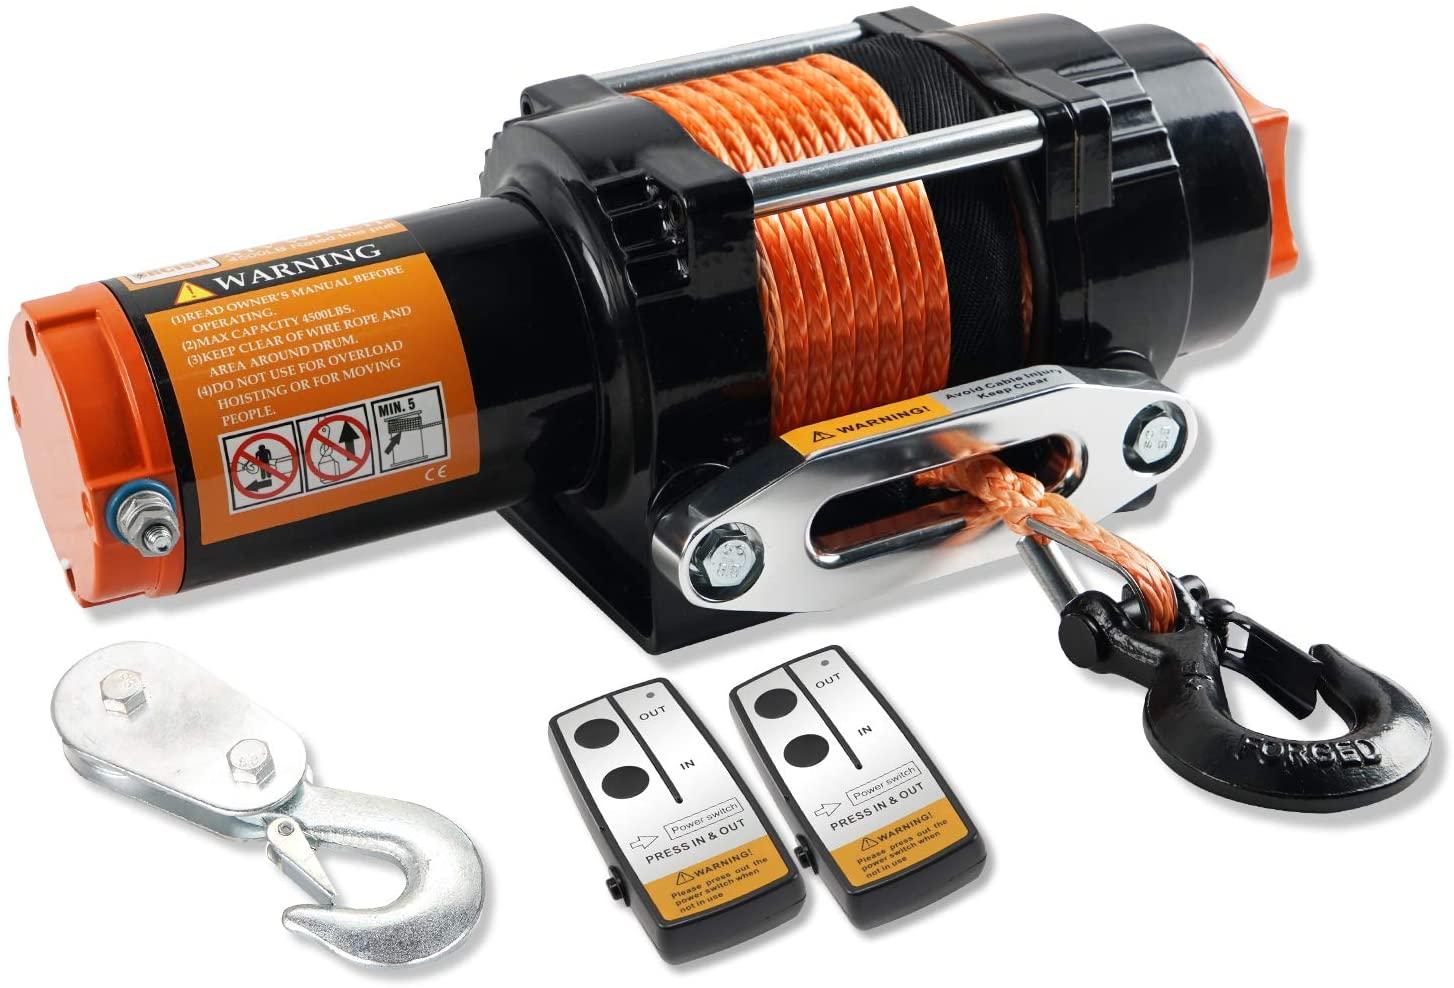 ORCISH 12V Waterproof 4500lb Electric ATV UTV Synthetic Rope Winch Kits